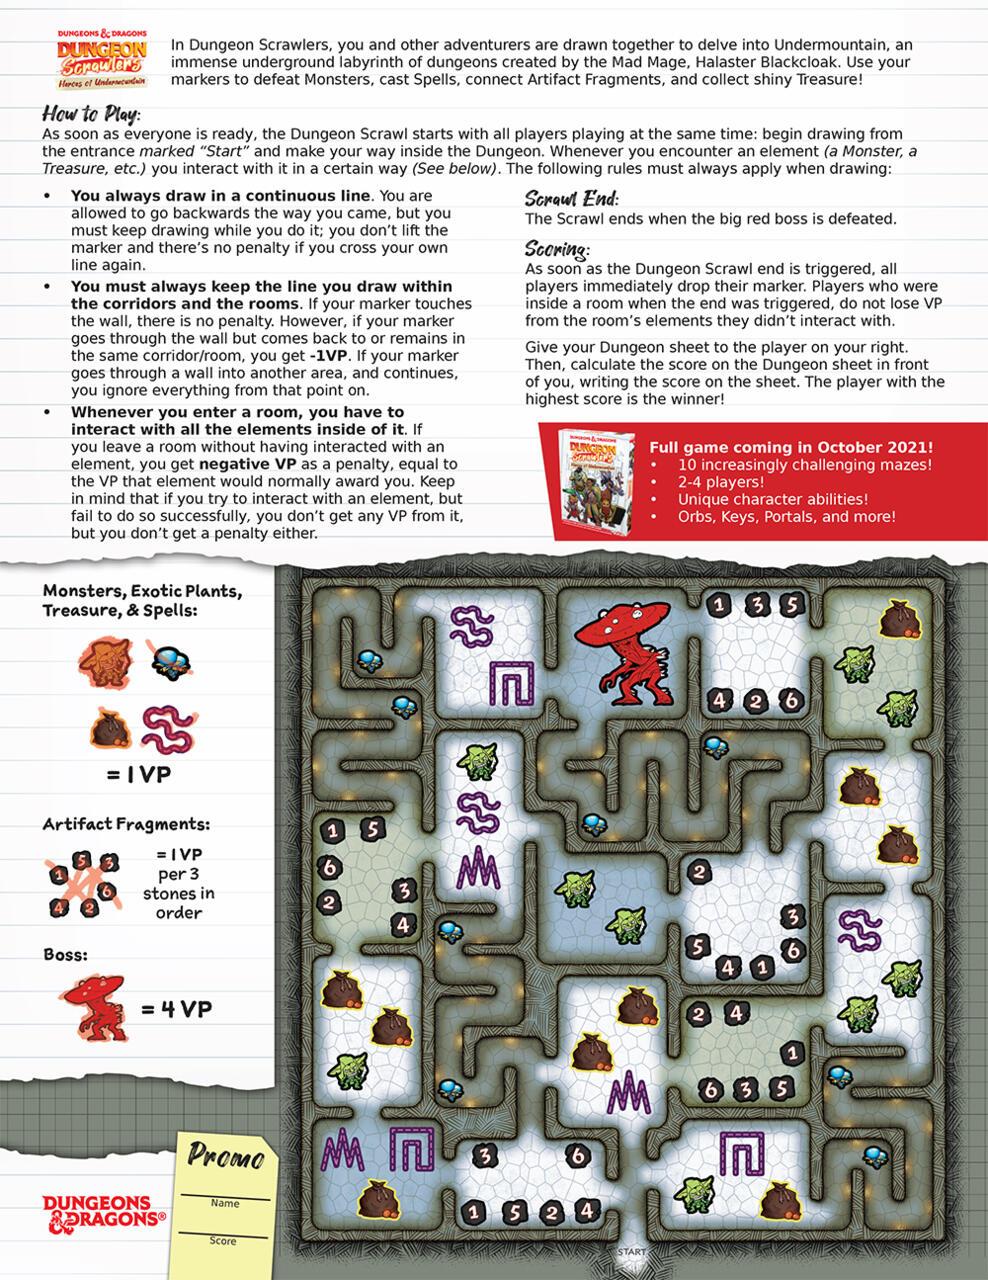 Regras do Dungeon Scrawlers